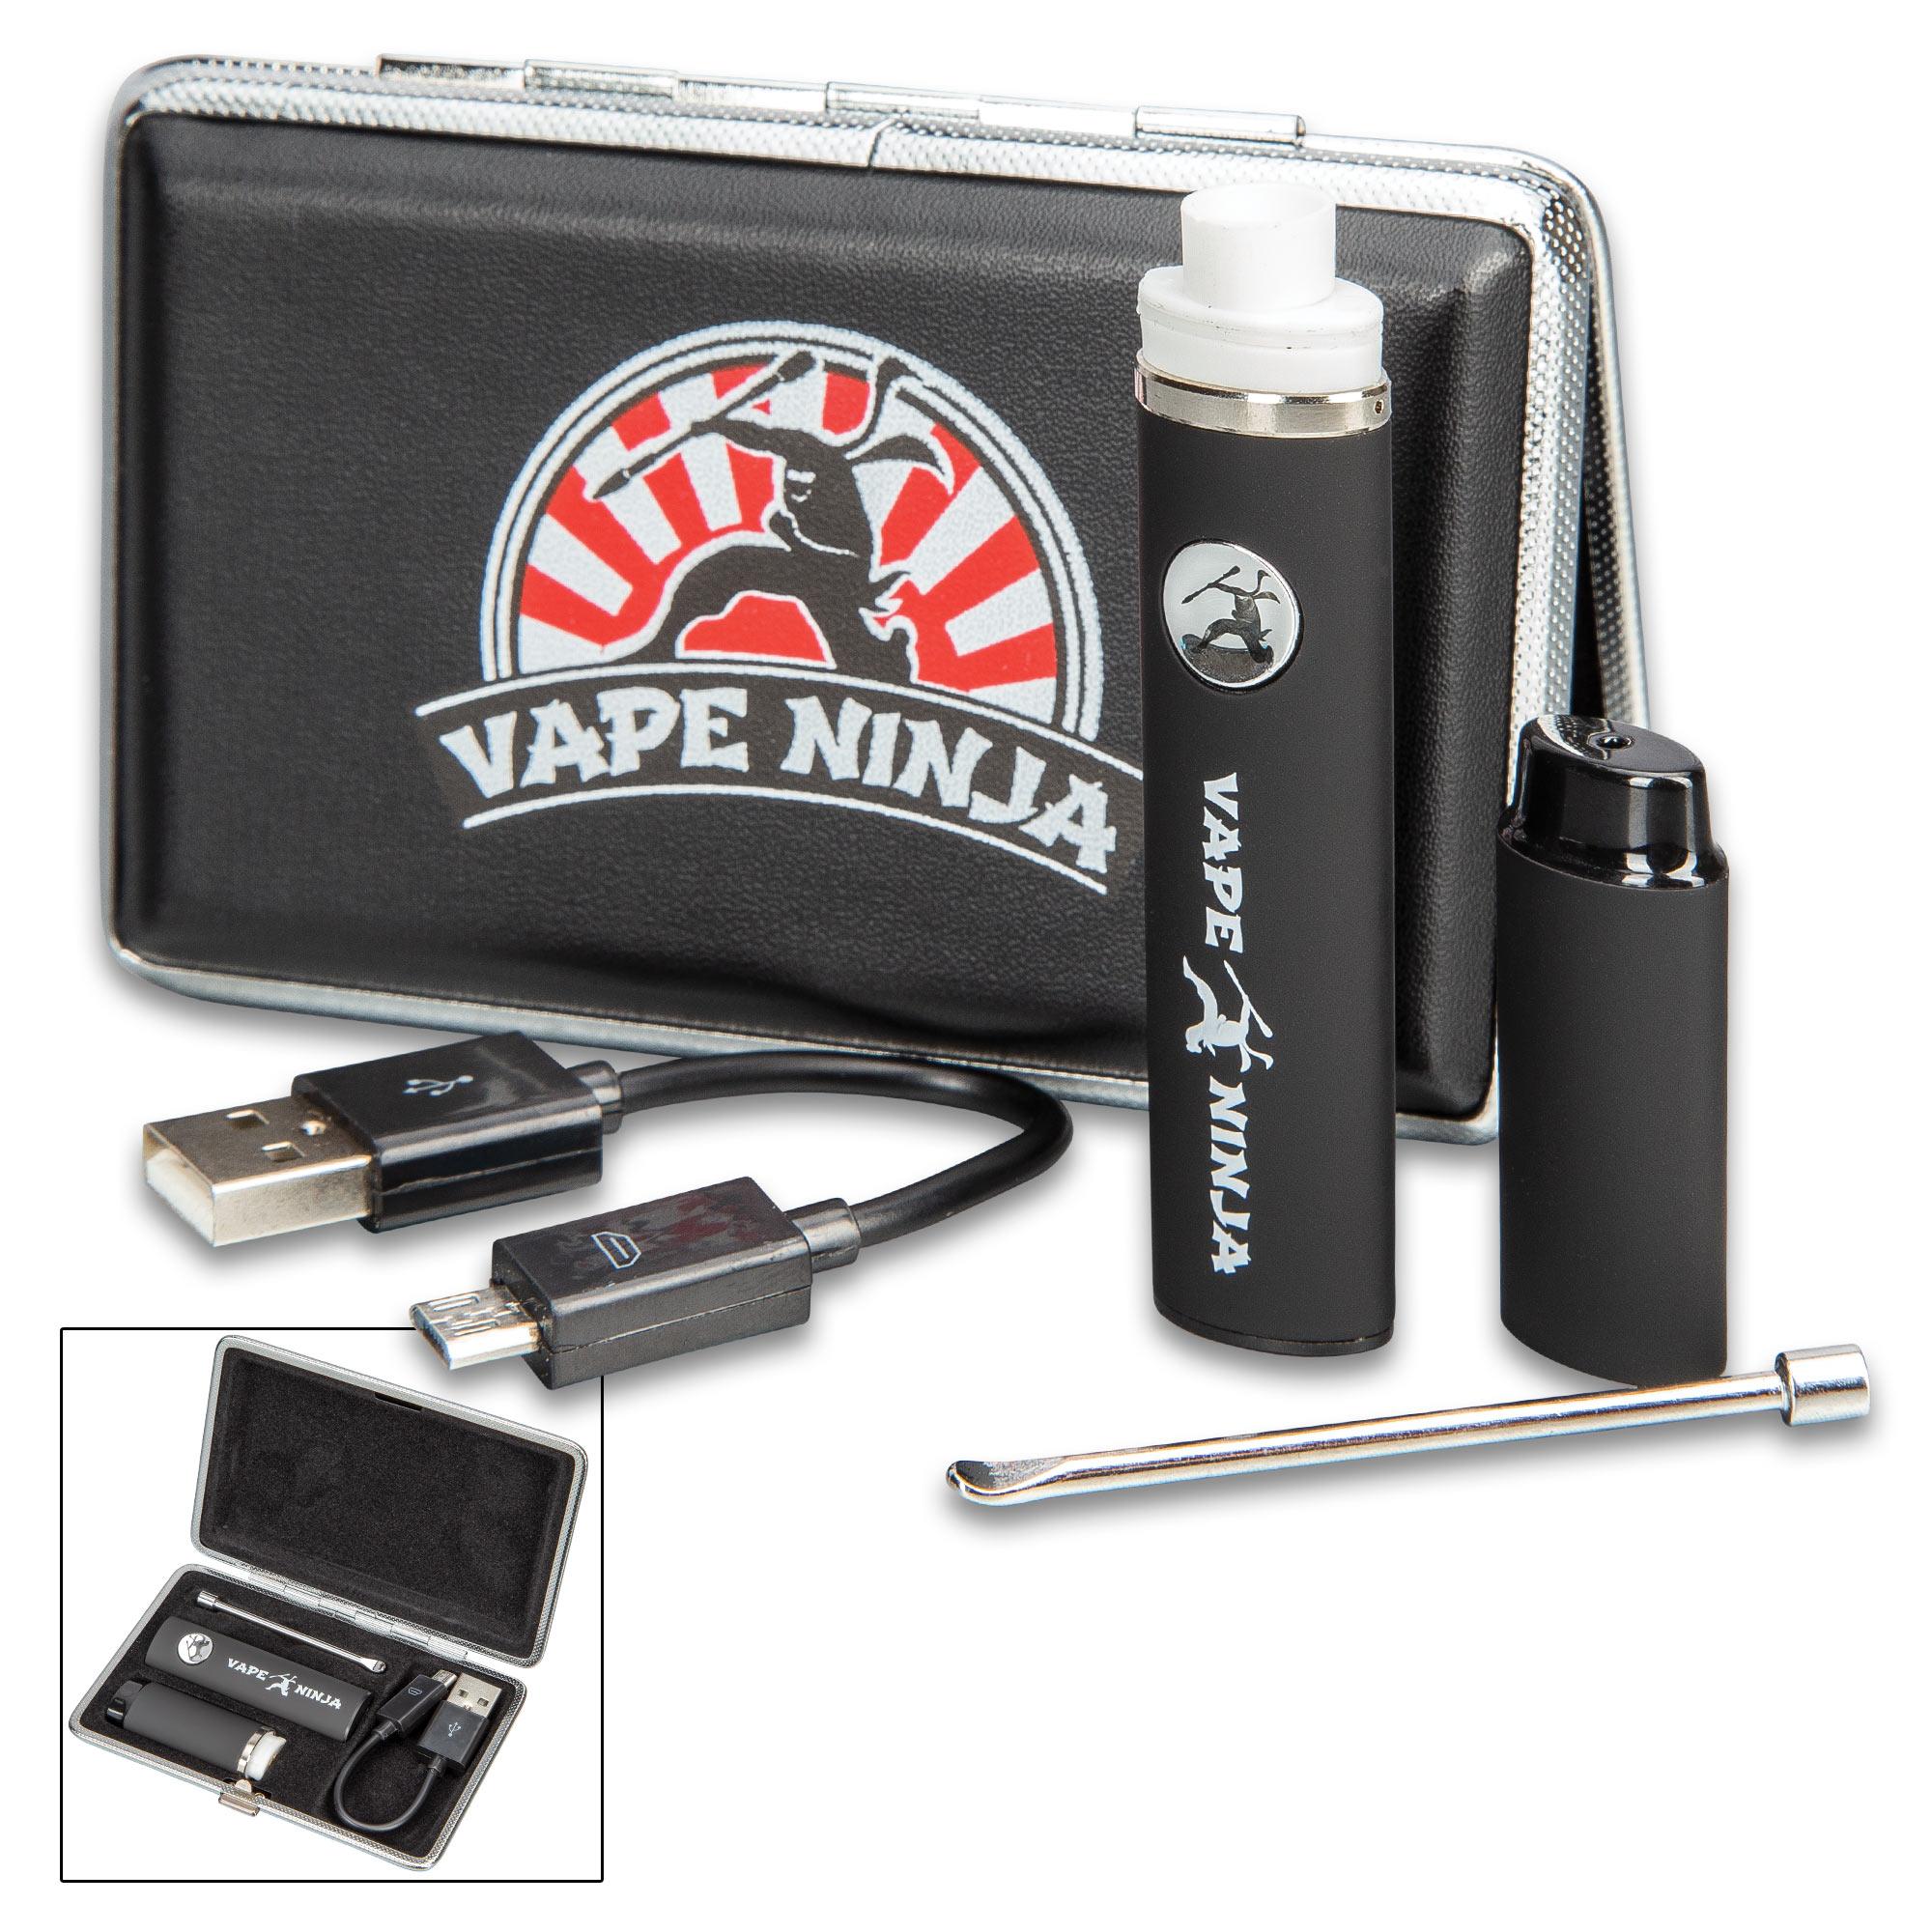 Vape Ninja Kato Micro Vape Pen With Case - Wickless Dual